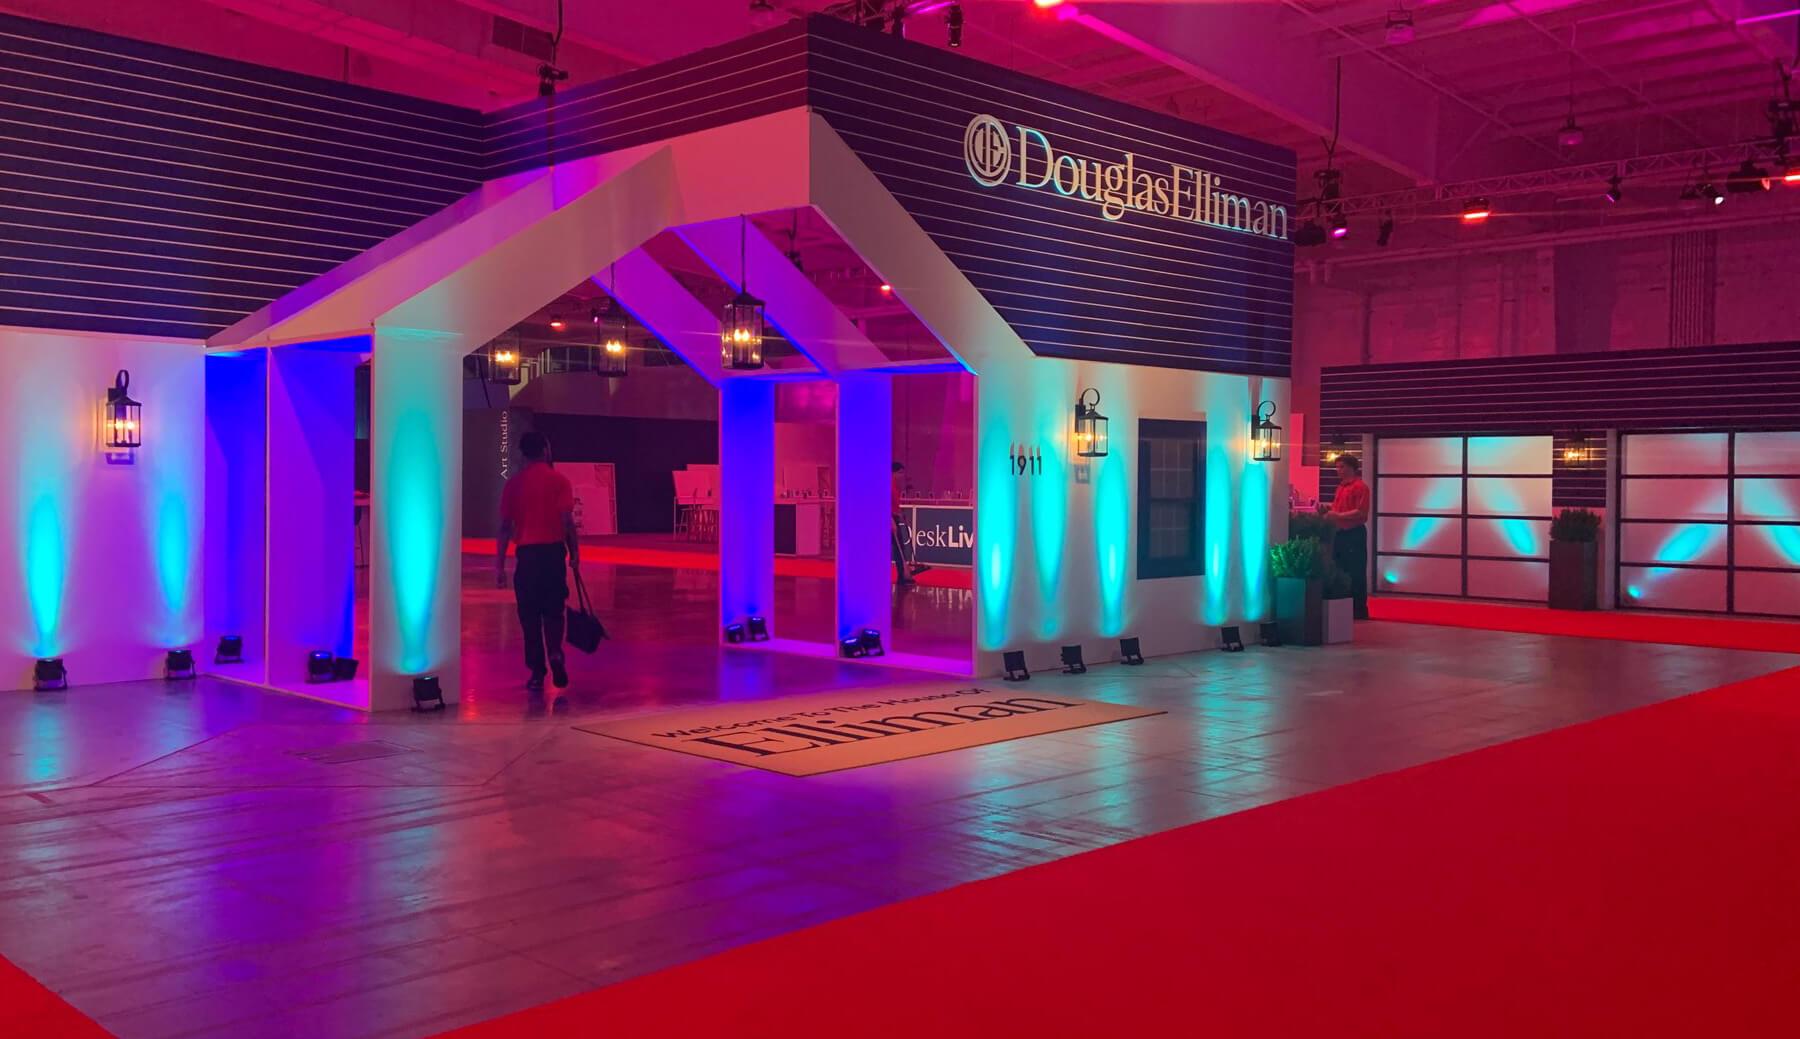 Trade show space with Douglas Elliman build